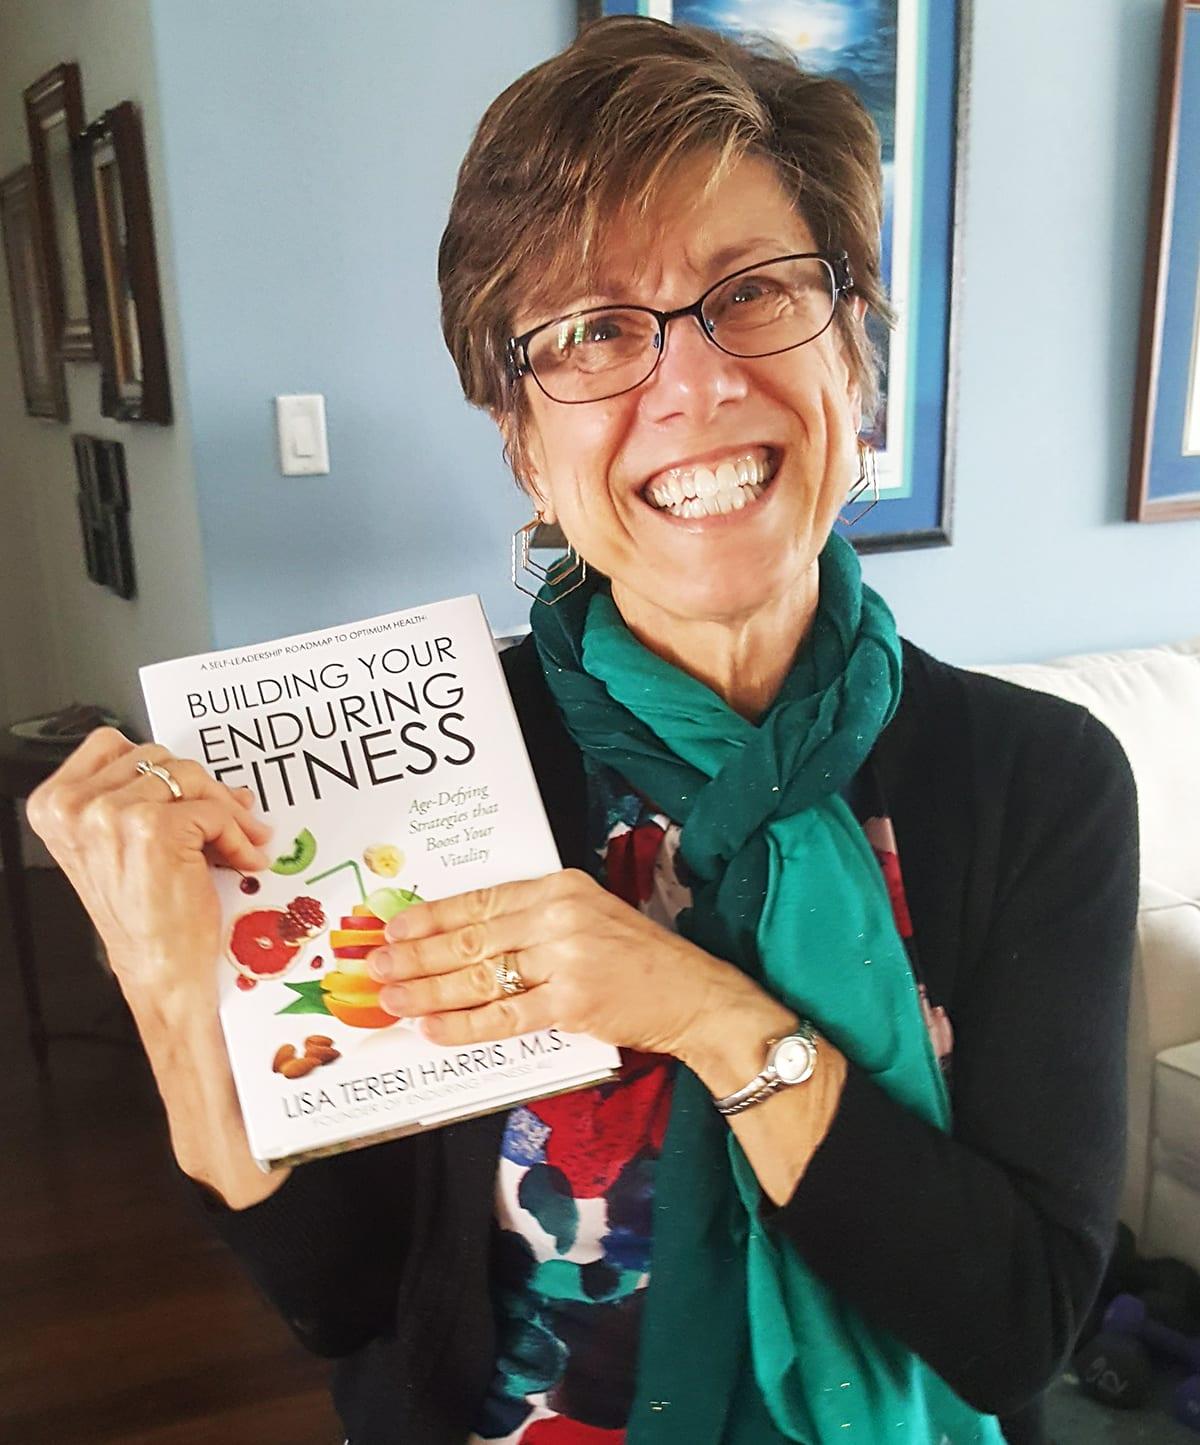 EnduringFitness_LisaHarrisBook_1200px